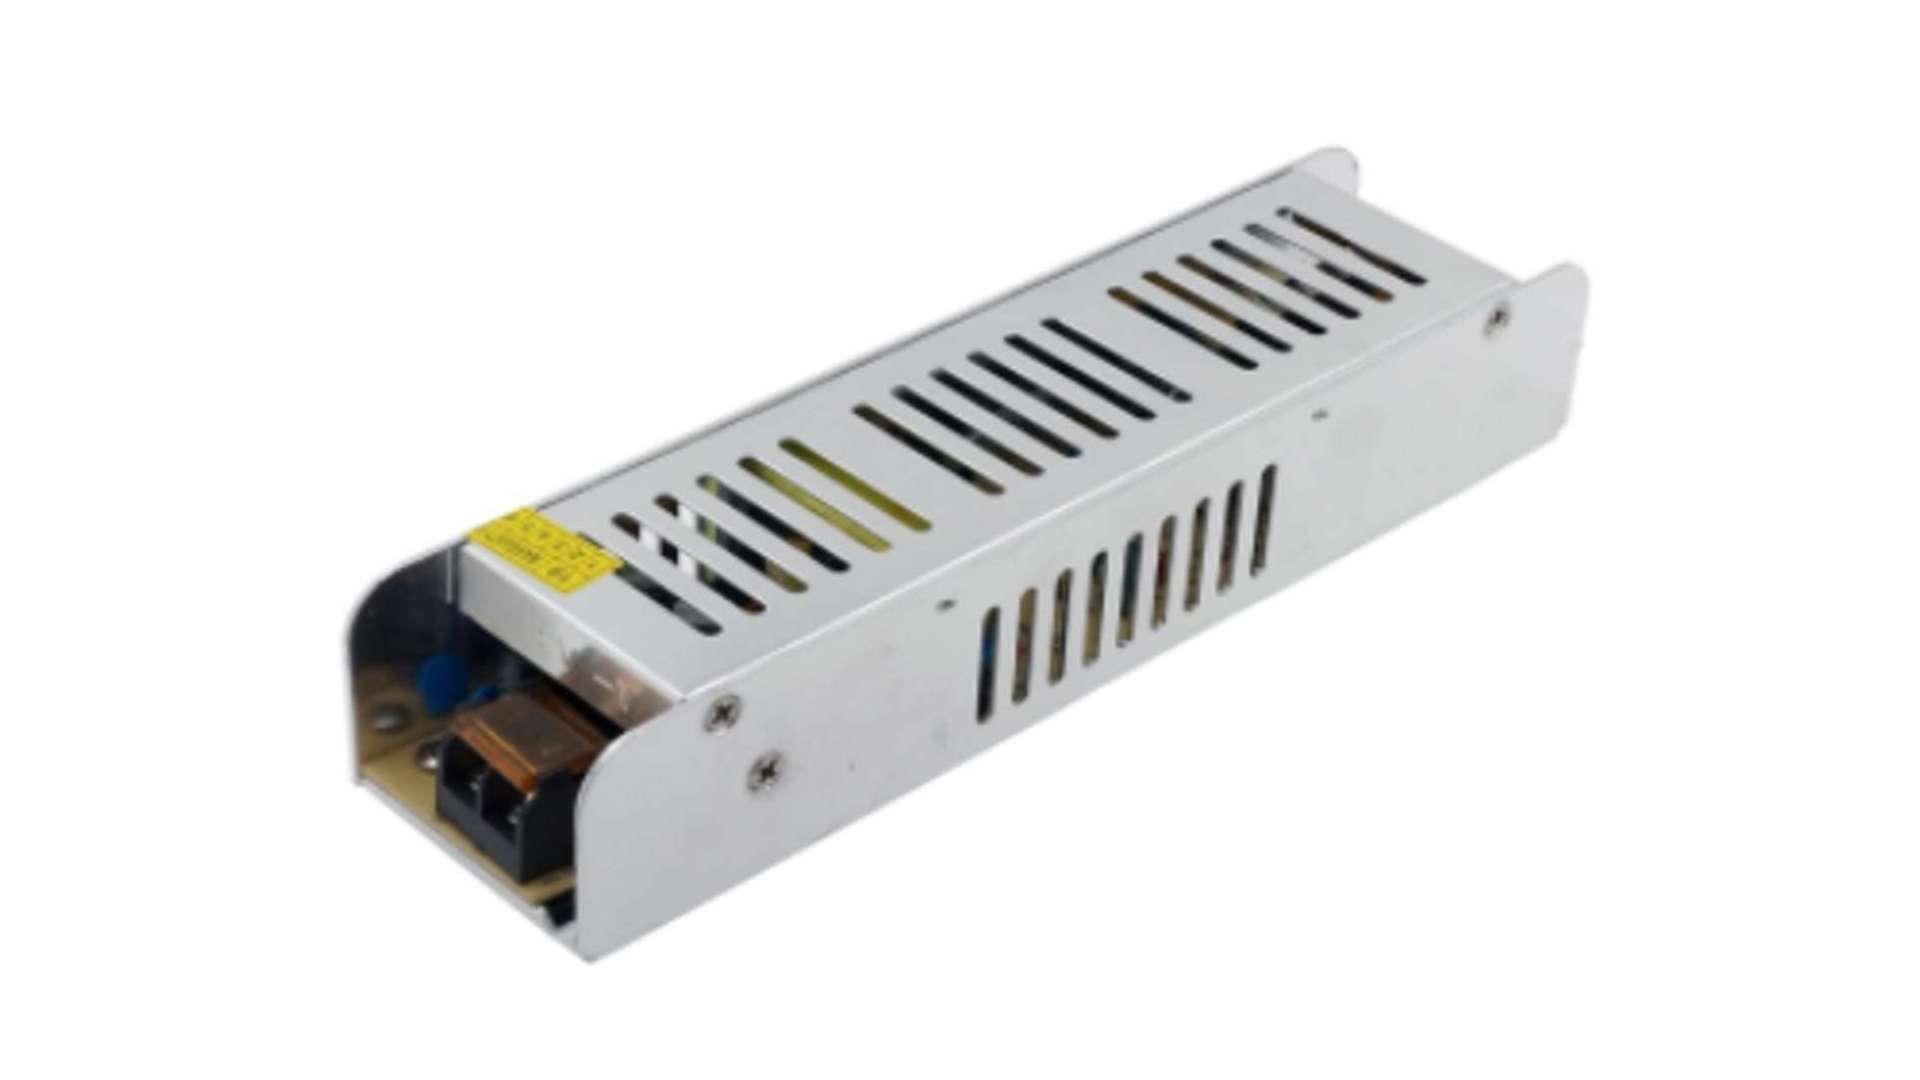 12V 250W IP20 enclosed power supply, SLIM